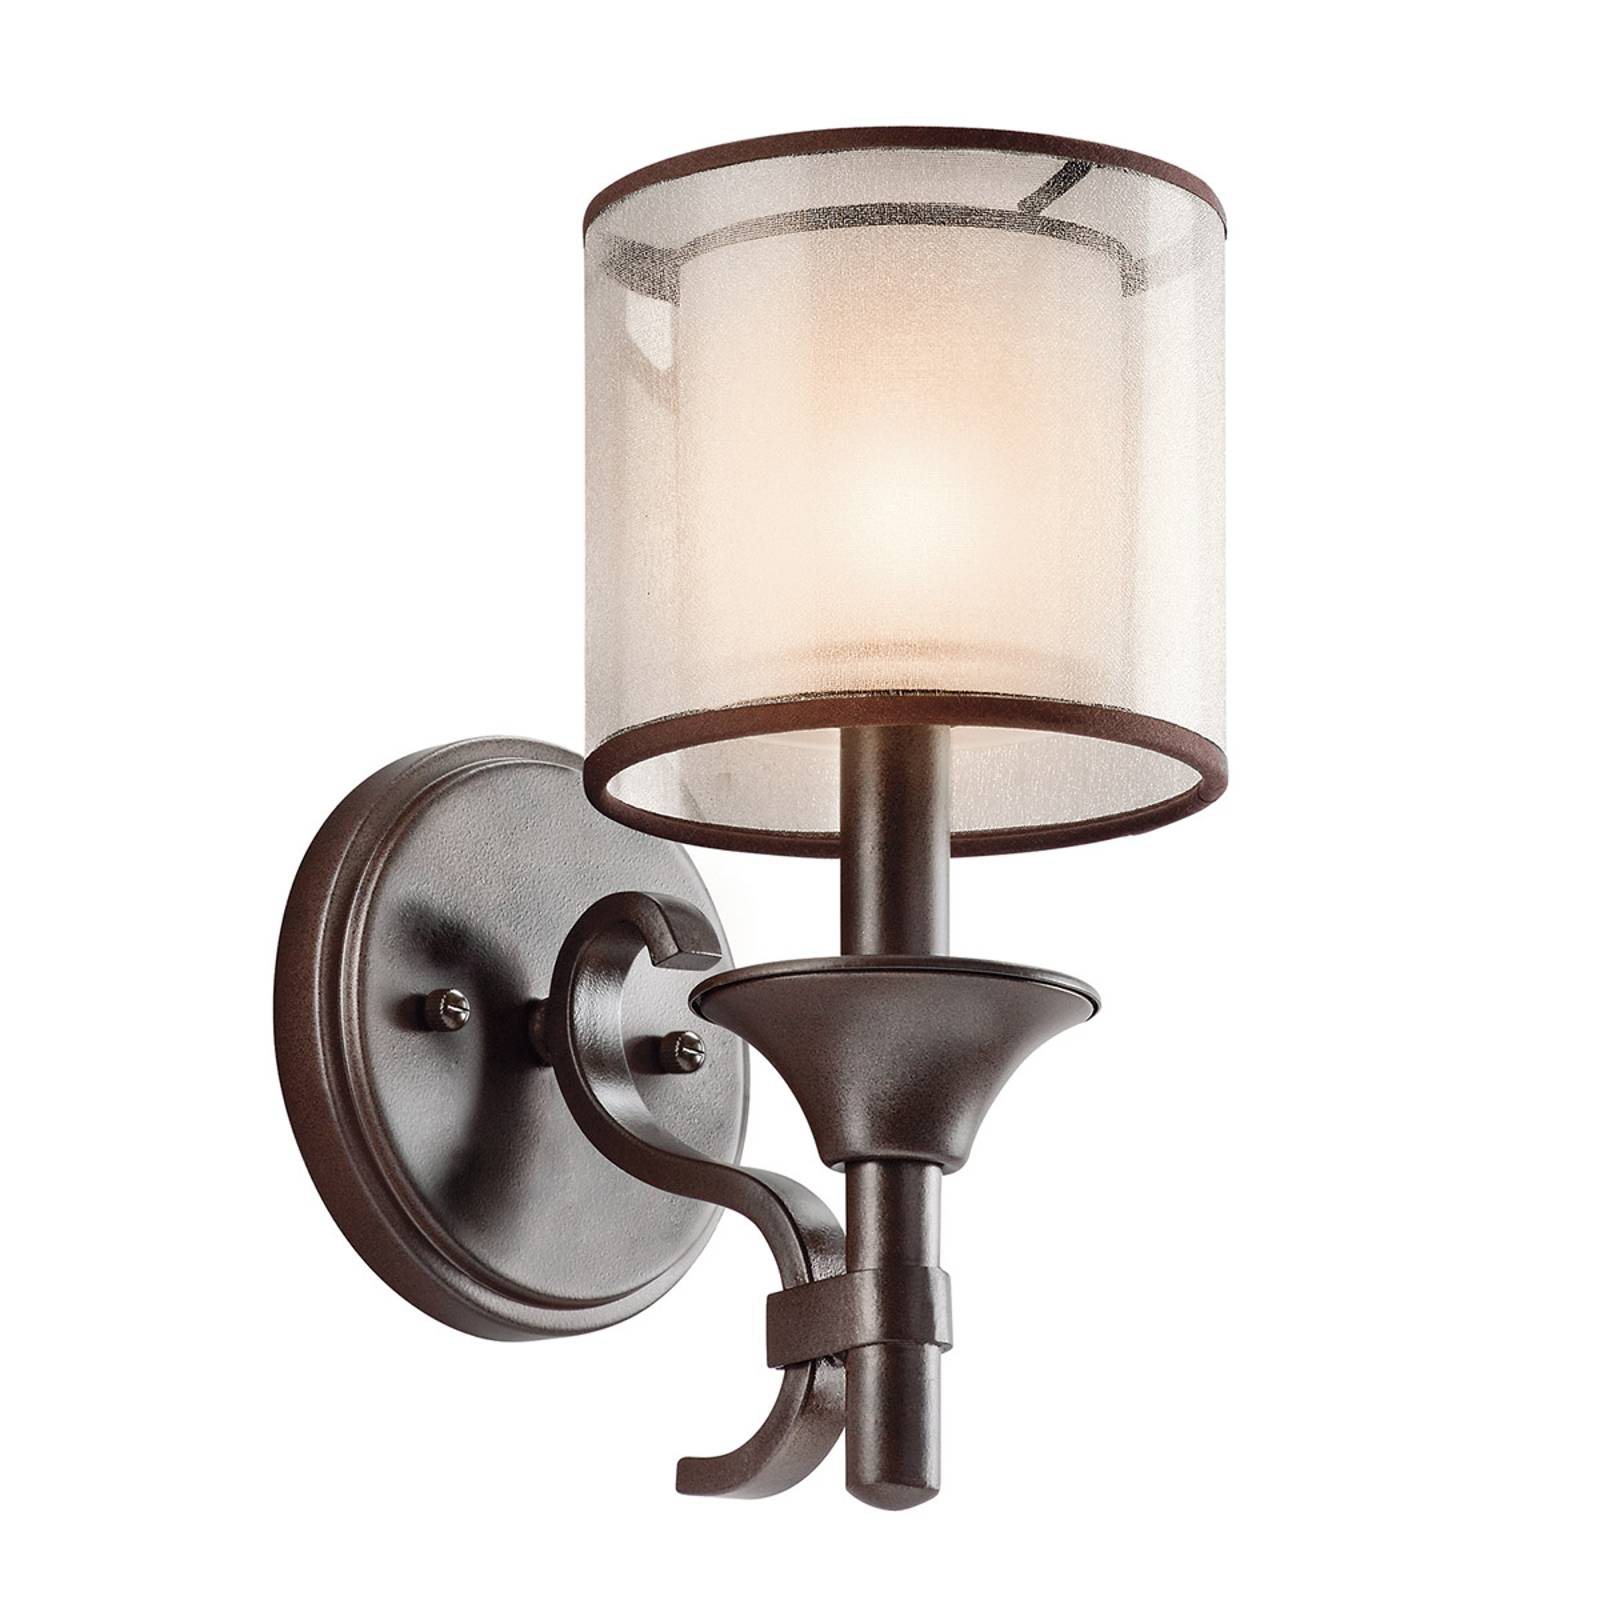 Wandlamp Lacey met dubbele kap